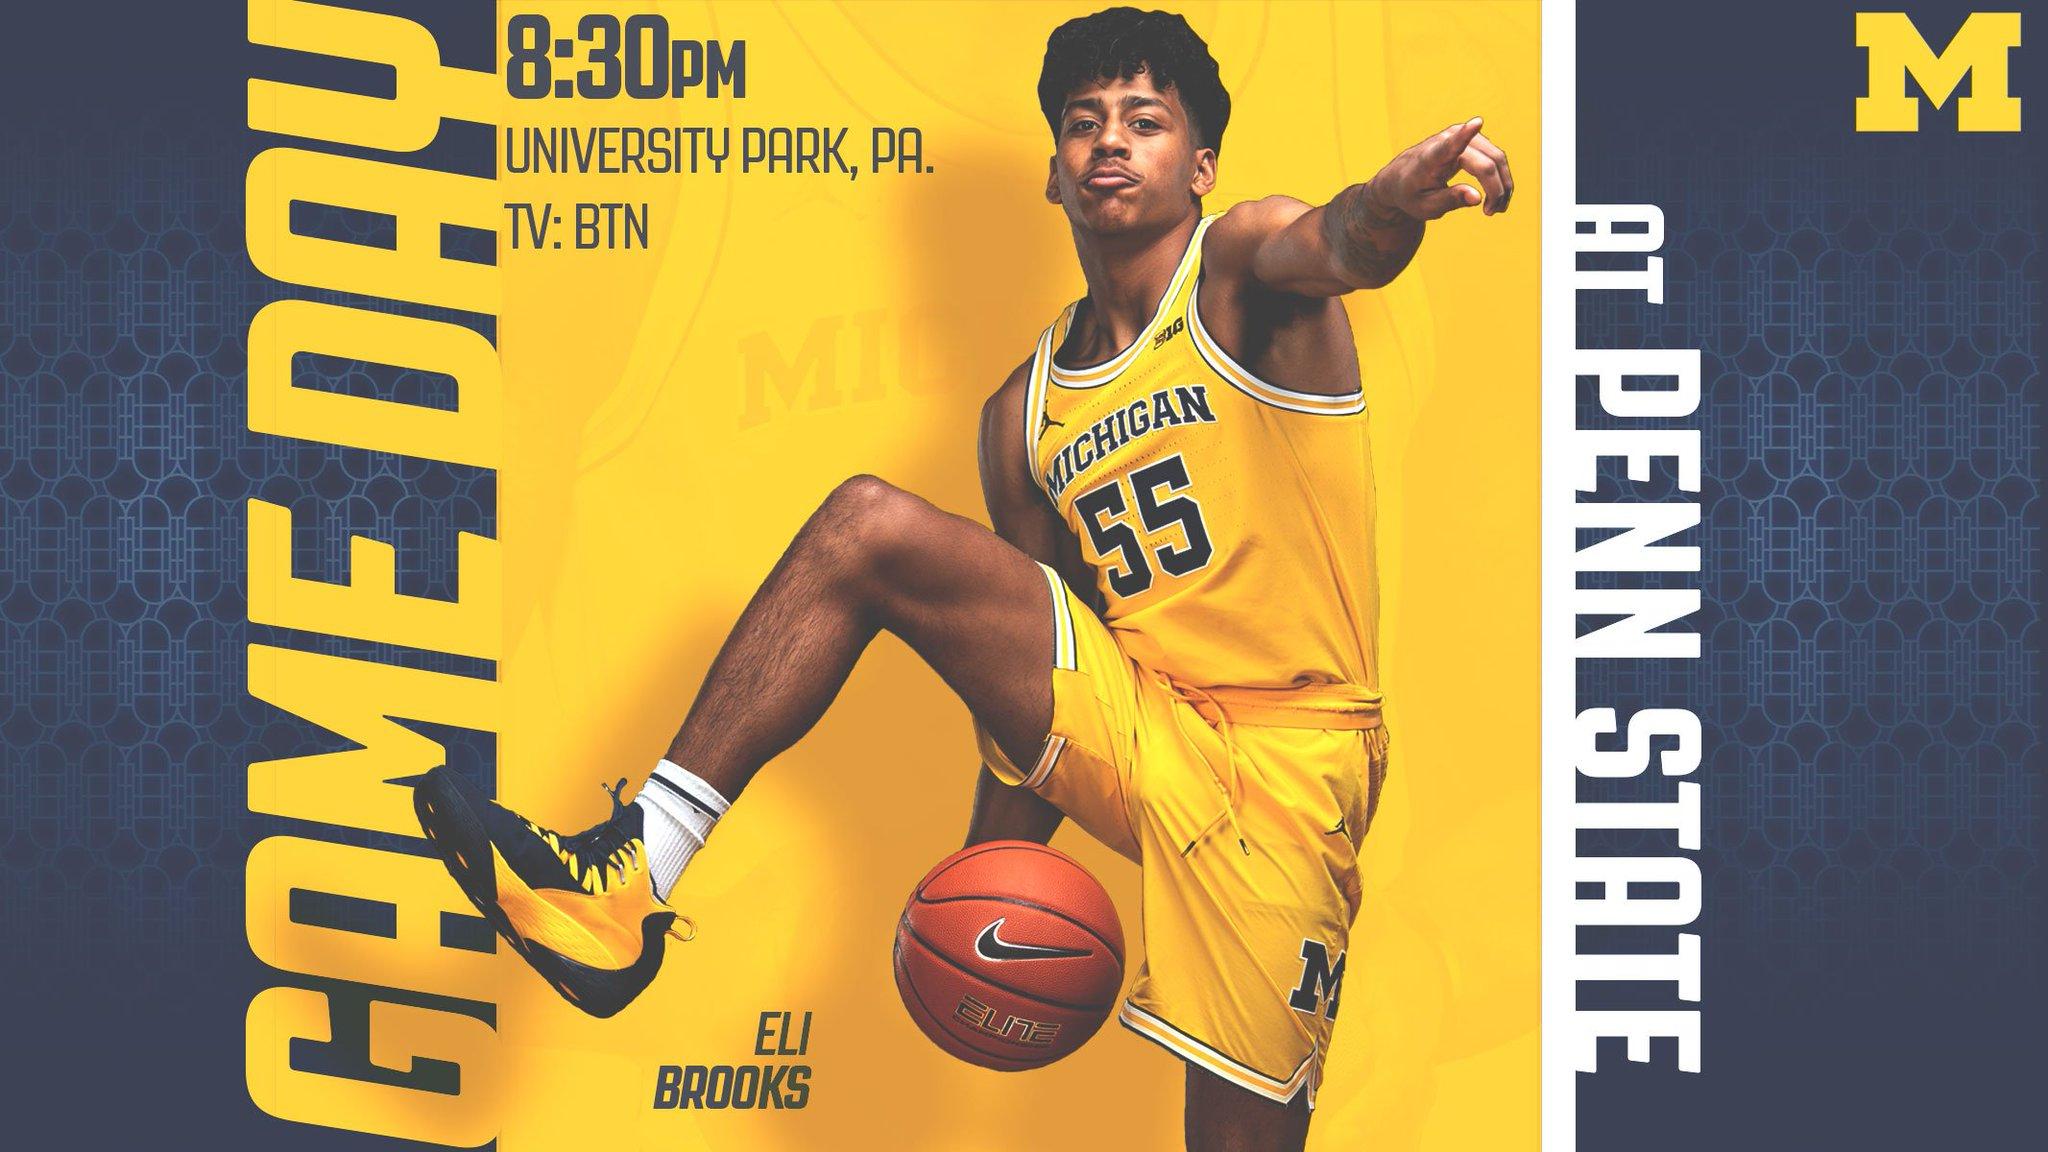 Michigan Wolverines NCAA Basketball: IT'S GAMEDAY!   🆚: at Penn State 📍: University Park, Pa. 🏟: Bryce Jordan Cente...